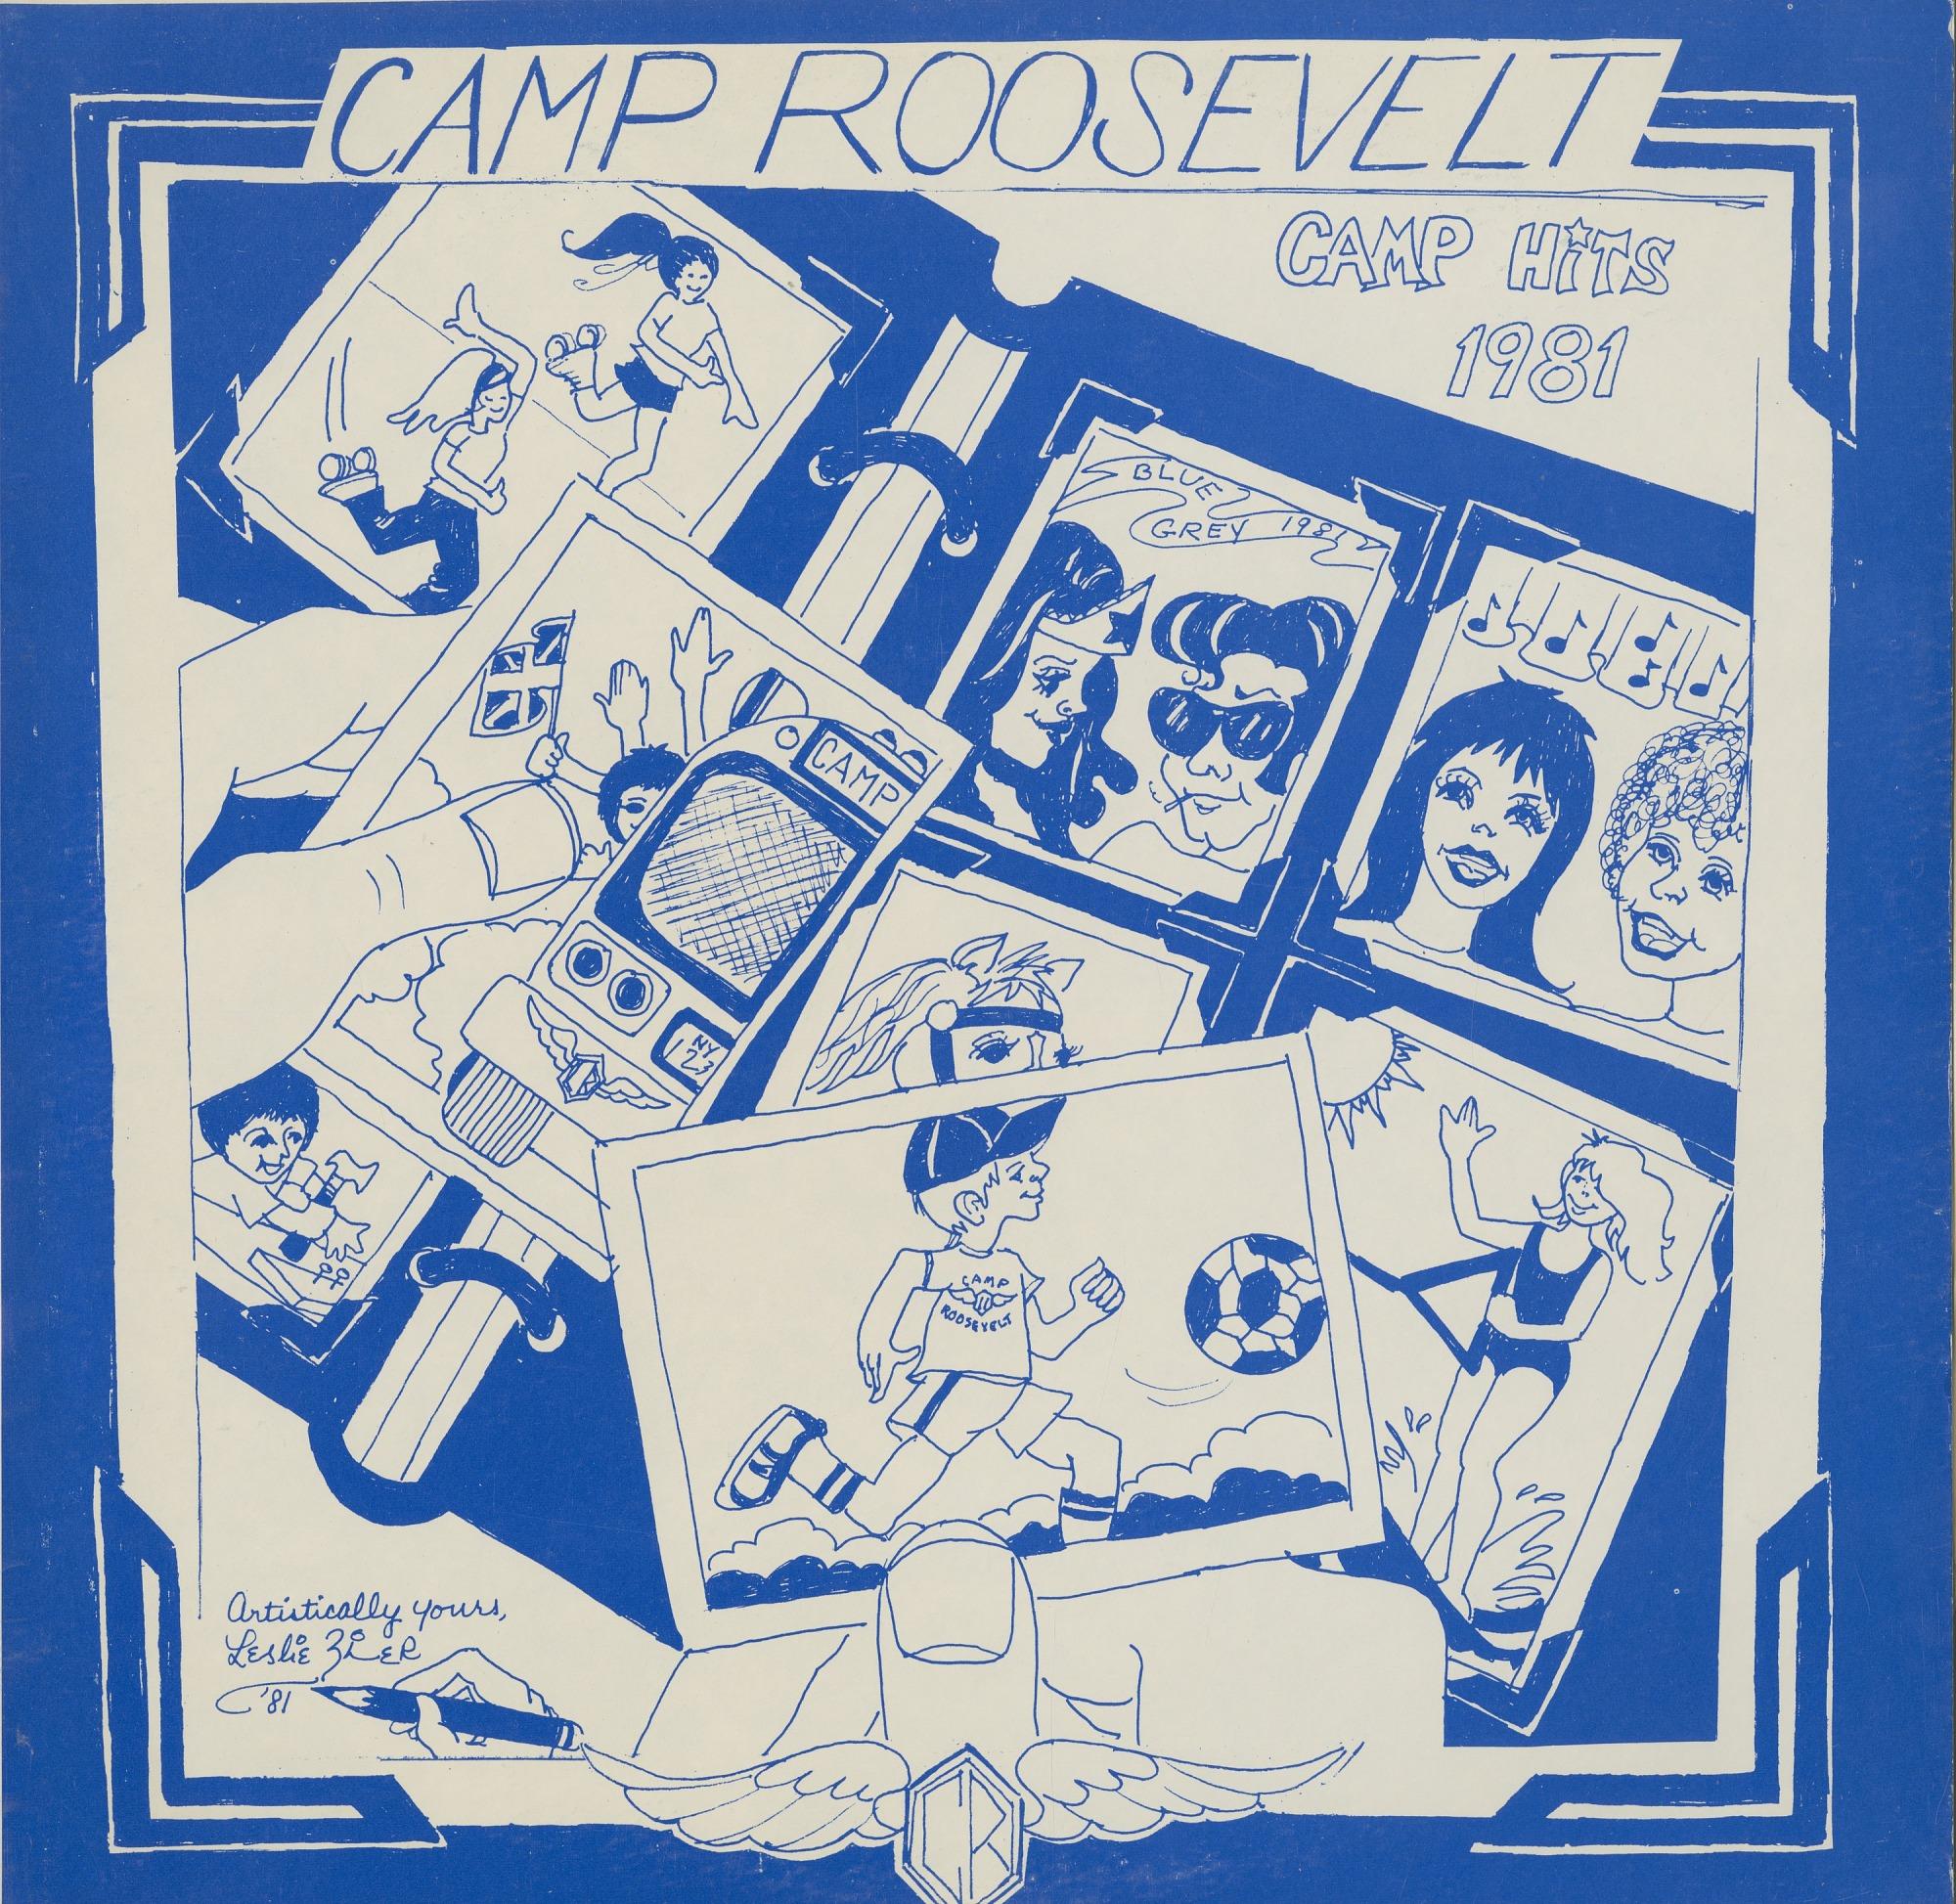 Camp Roosevelt Camp Hits